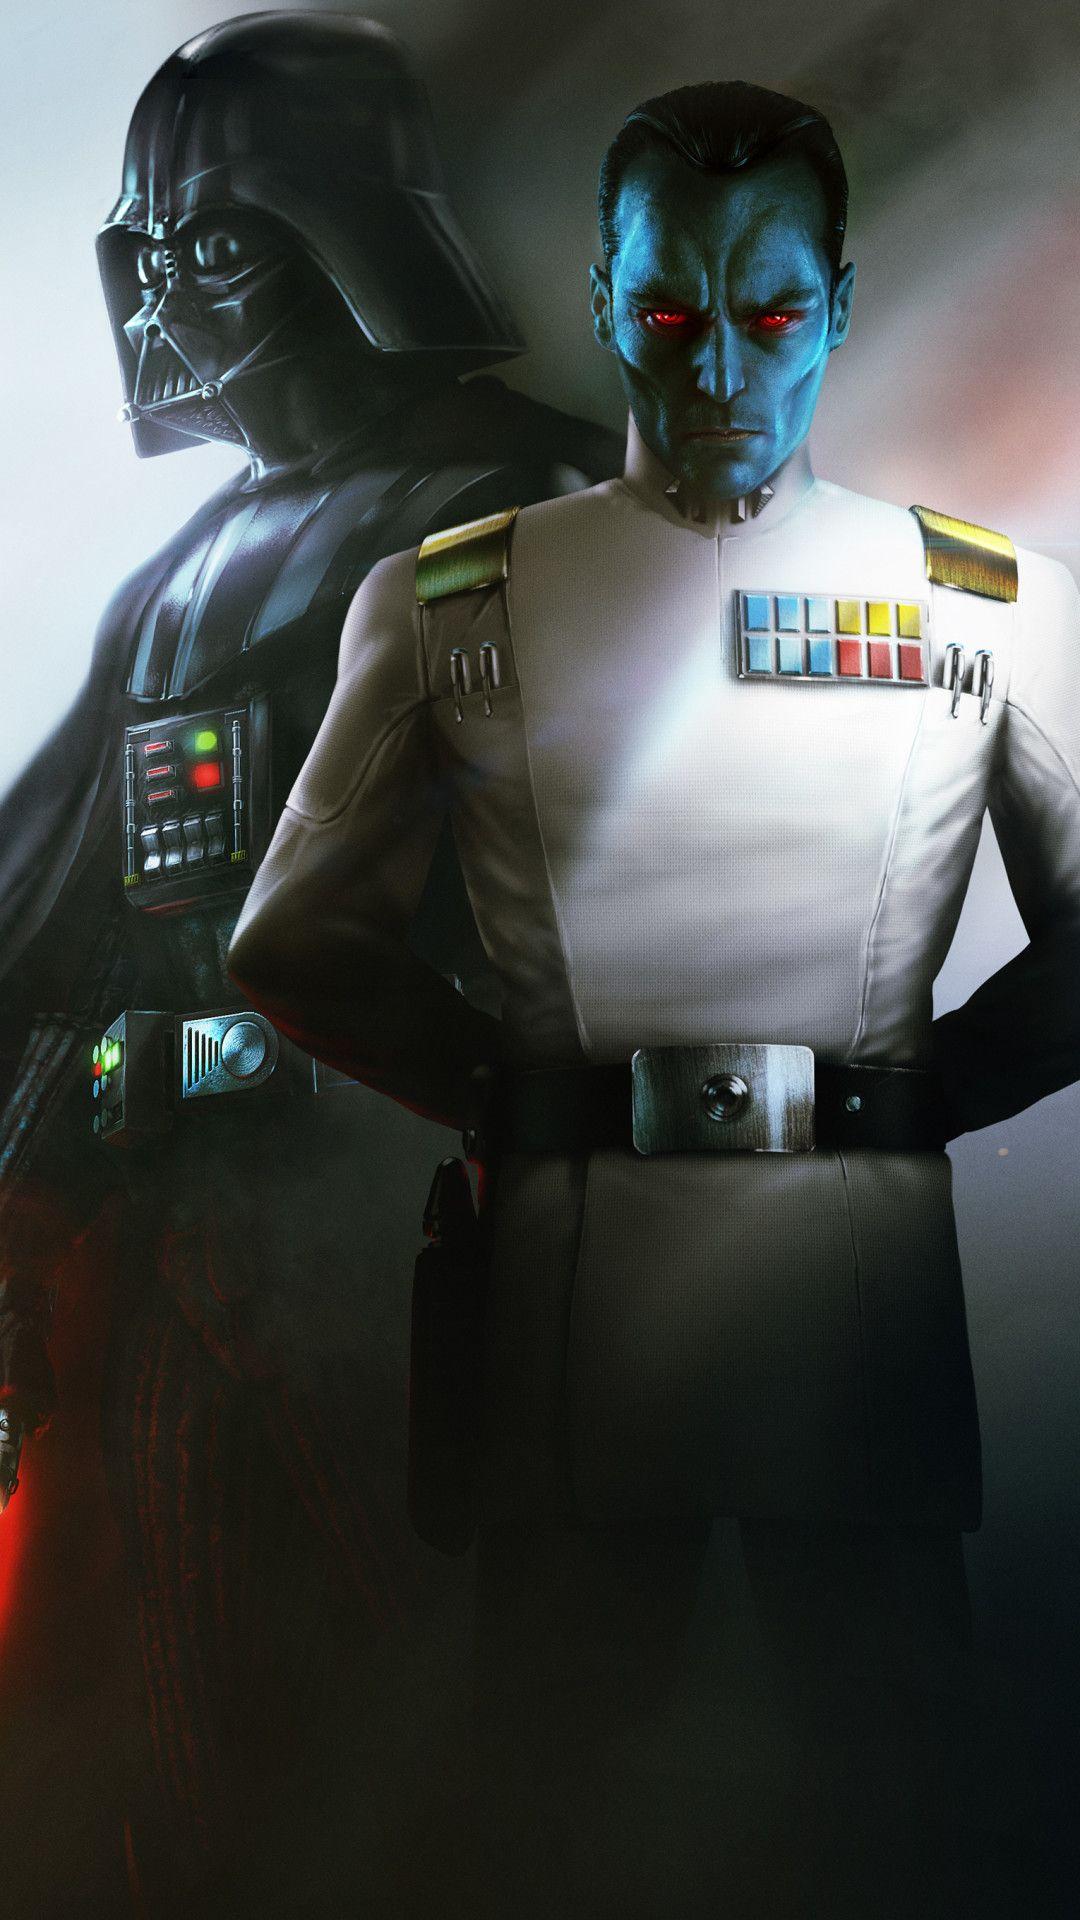 Star Wars Thrawn Alliances Mobile Wallpaper Iphone Android Samsung Pixel Xiaomi In 2020 Movie Wallpapers Star Wars War